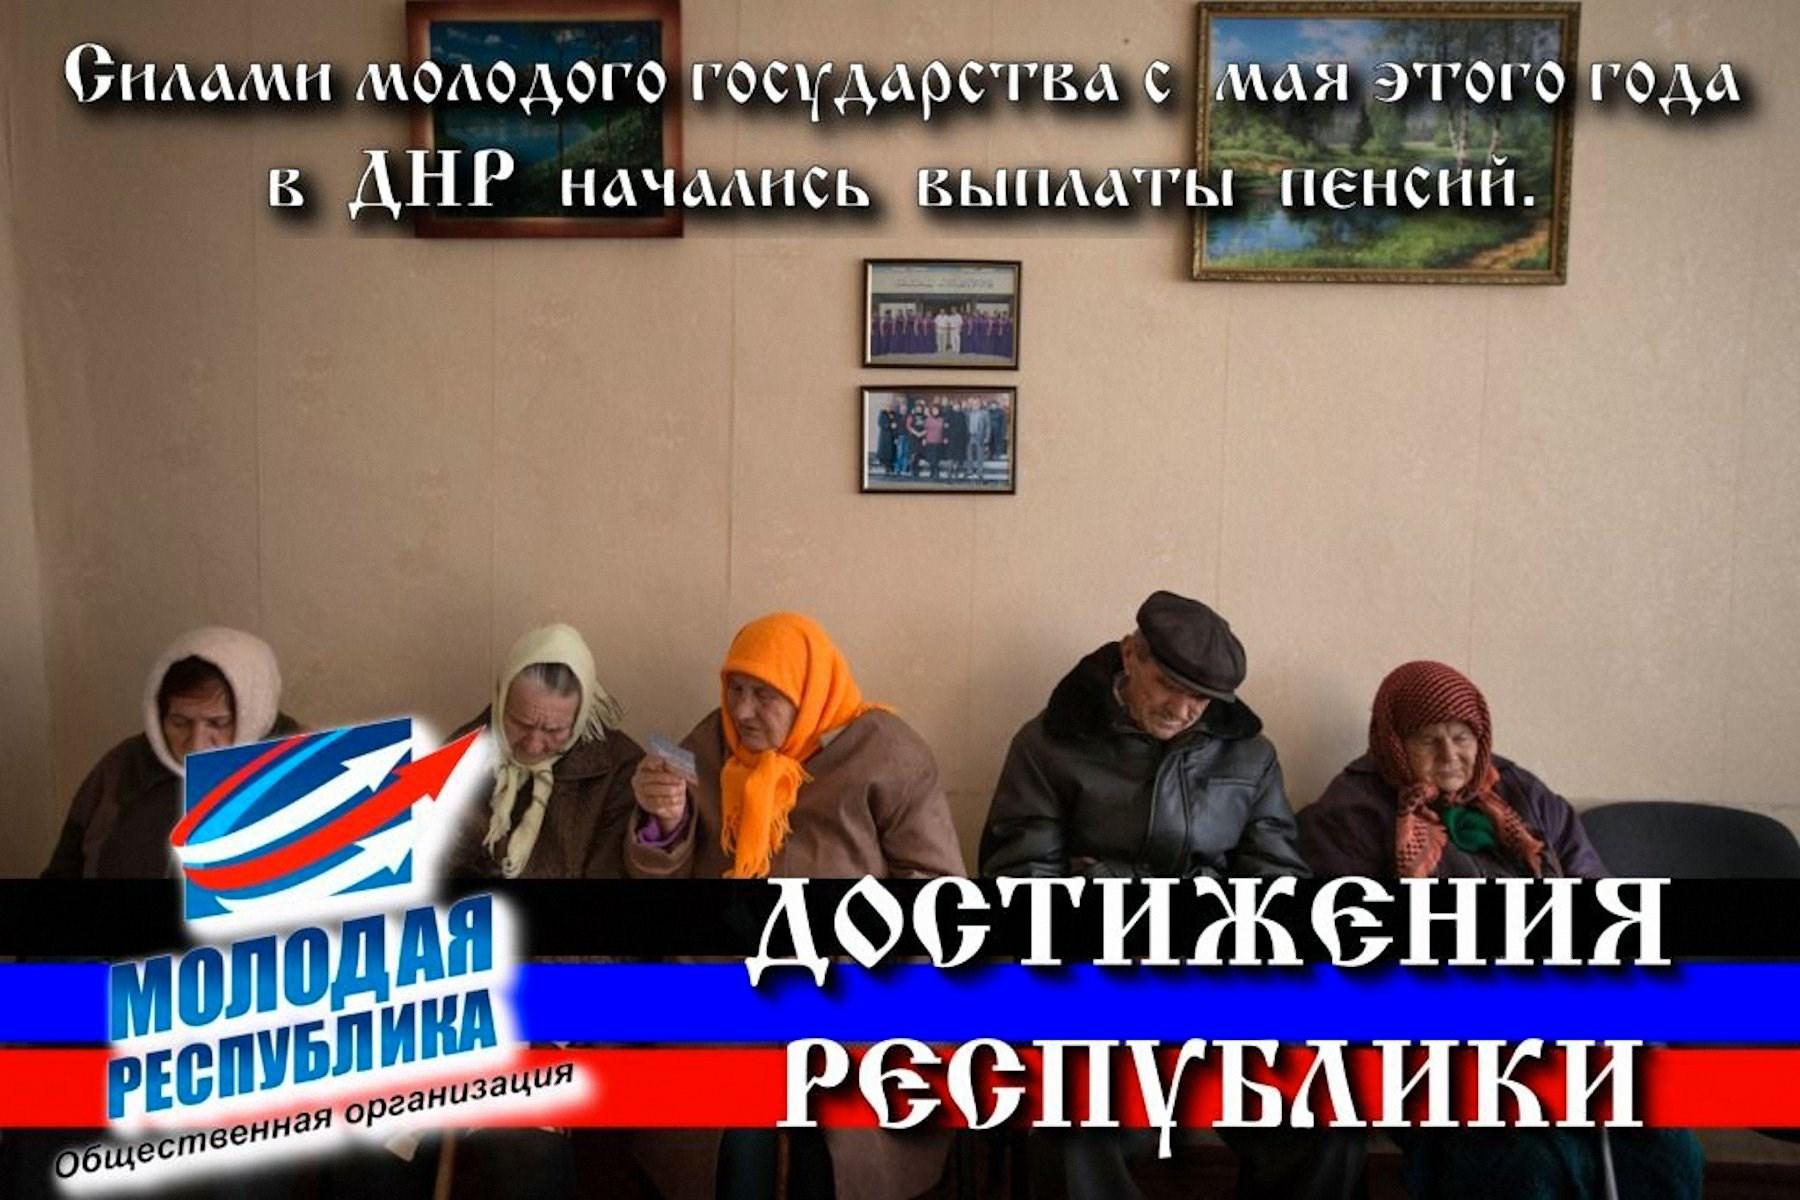 00 property of the republic dnr donetsk pr 09 280815